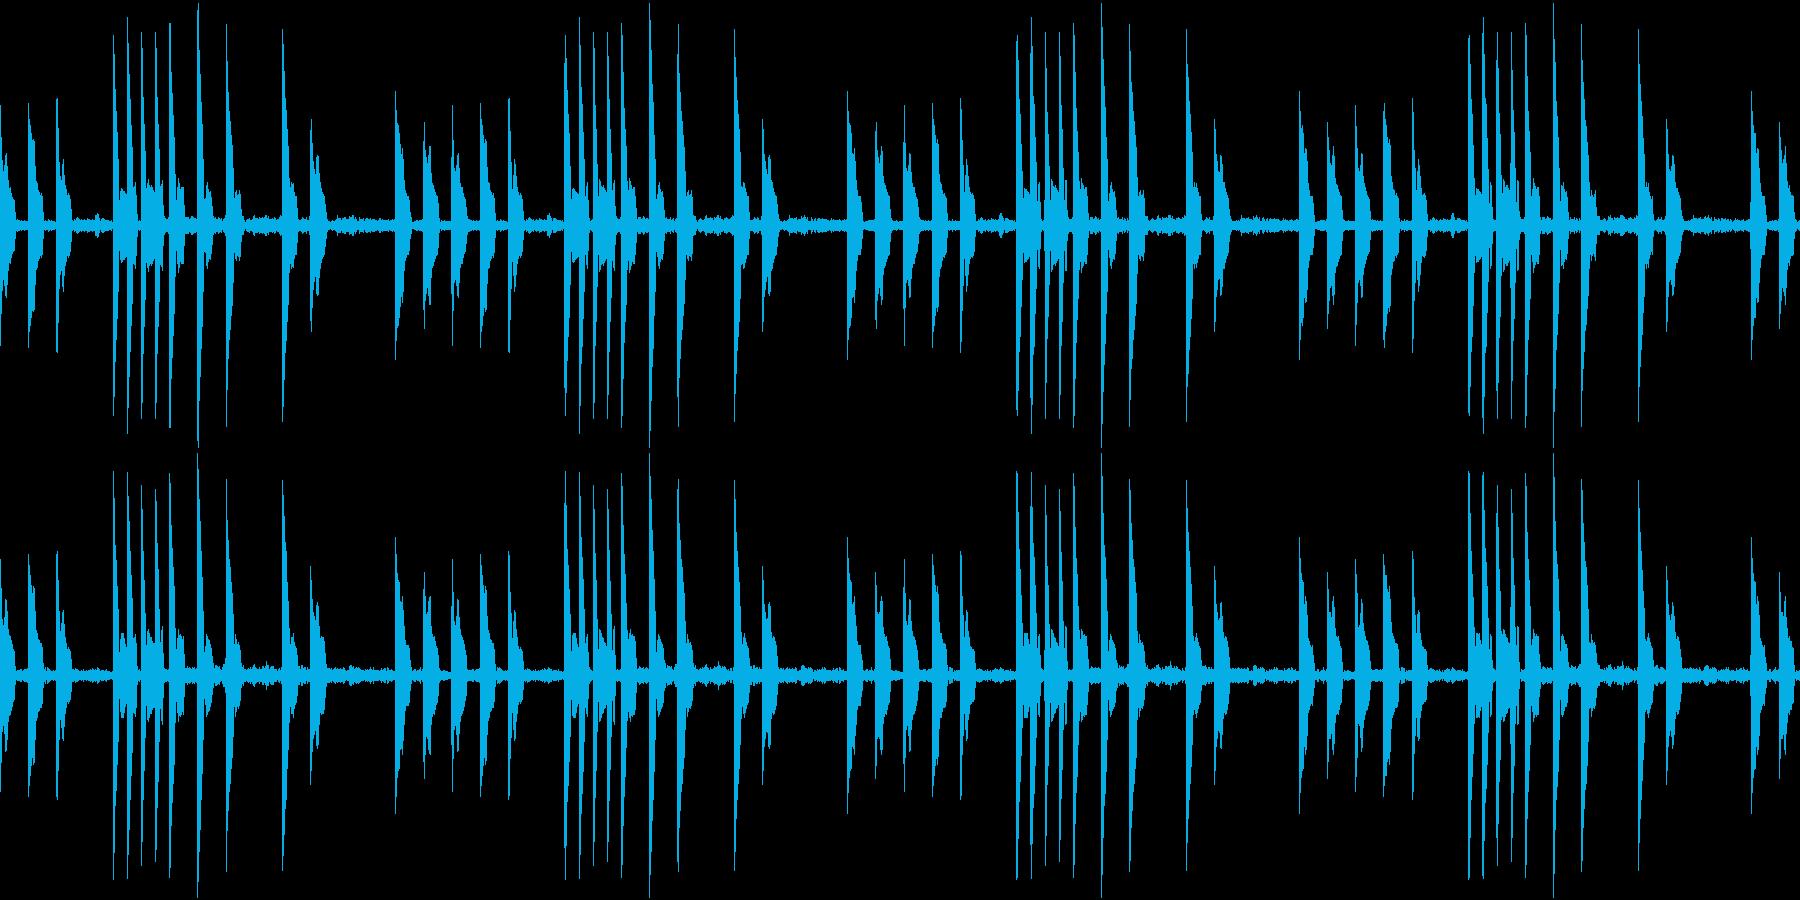 EDM リードシンセ 1 音楽制作用の再生済みの波形